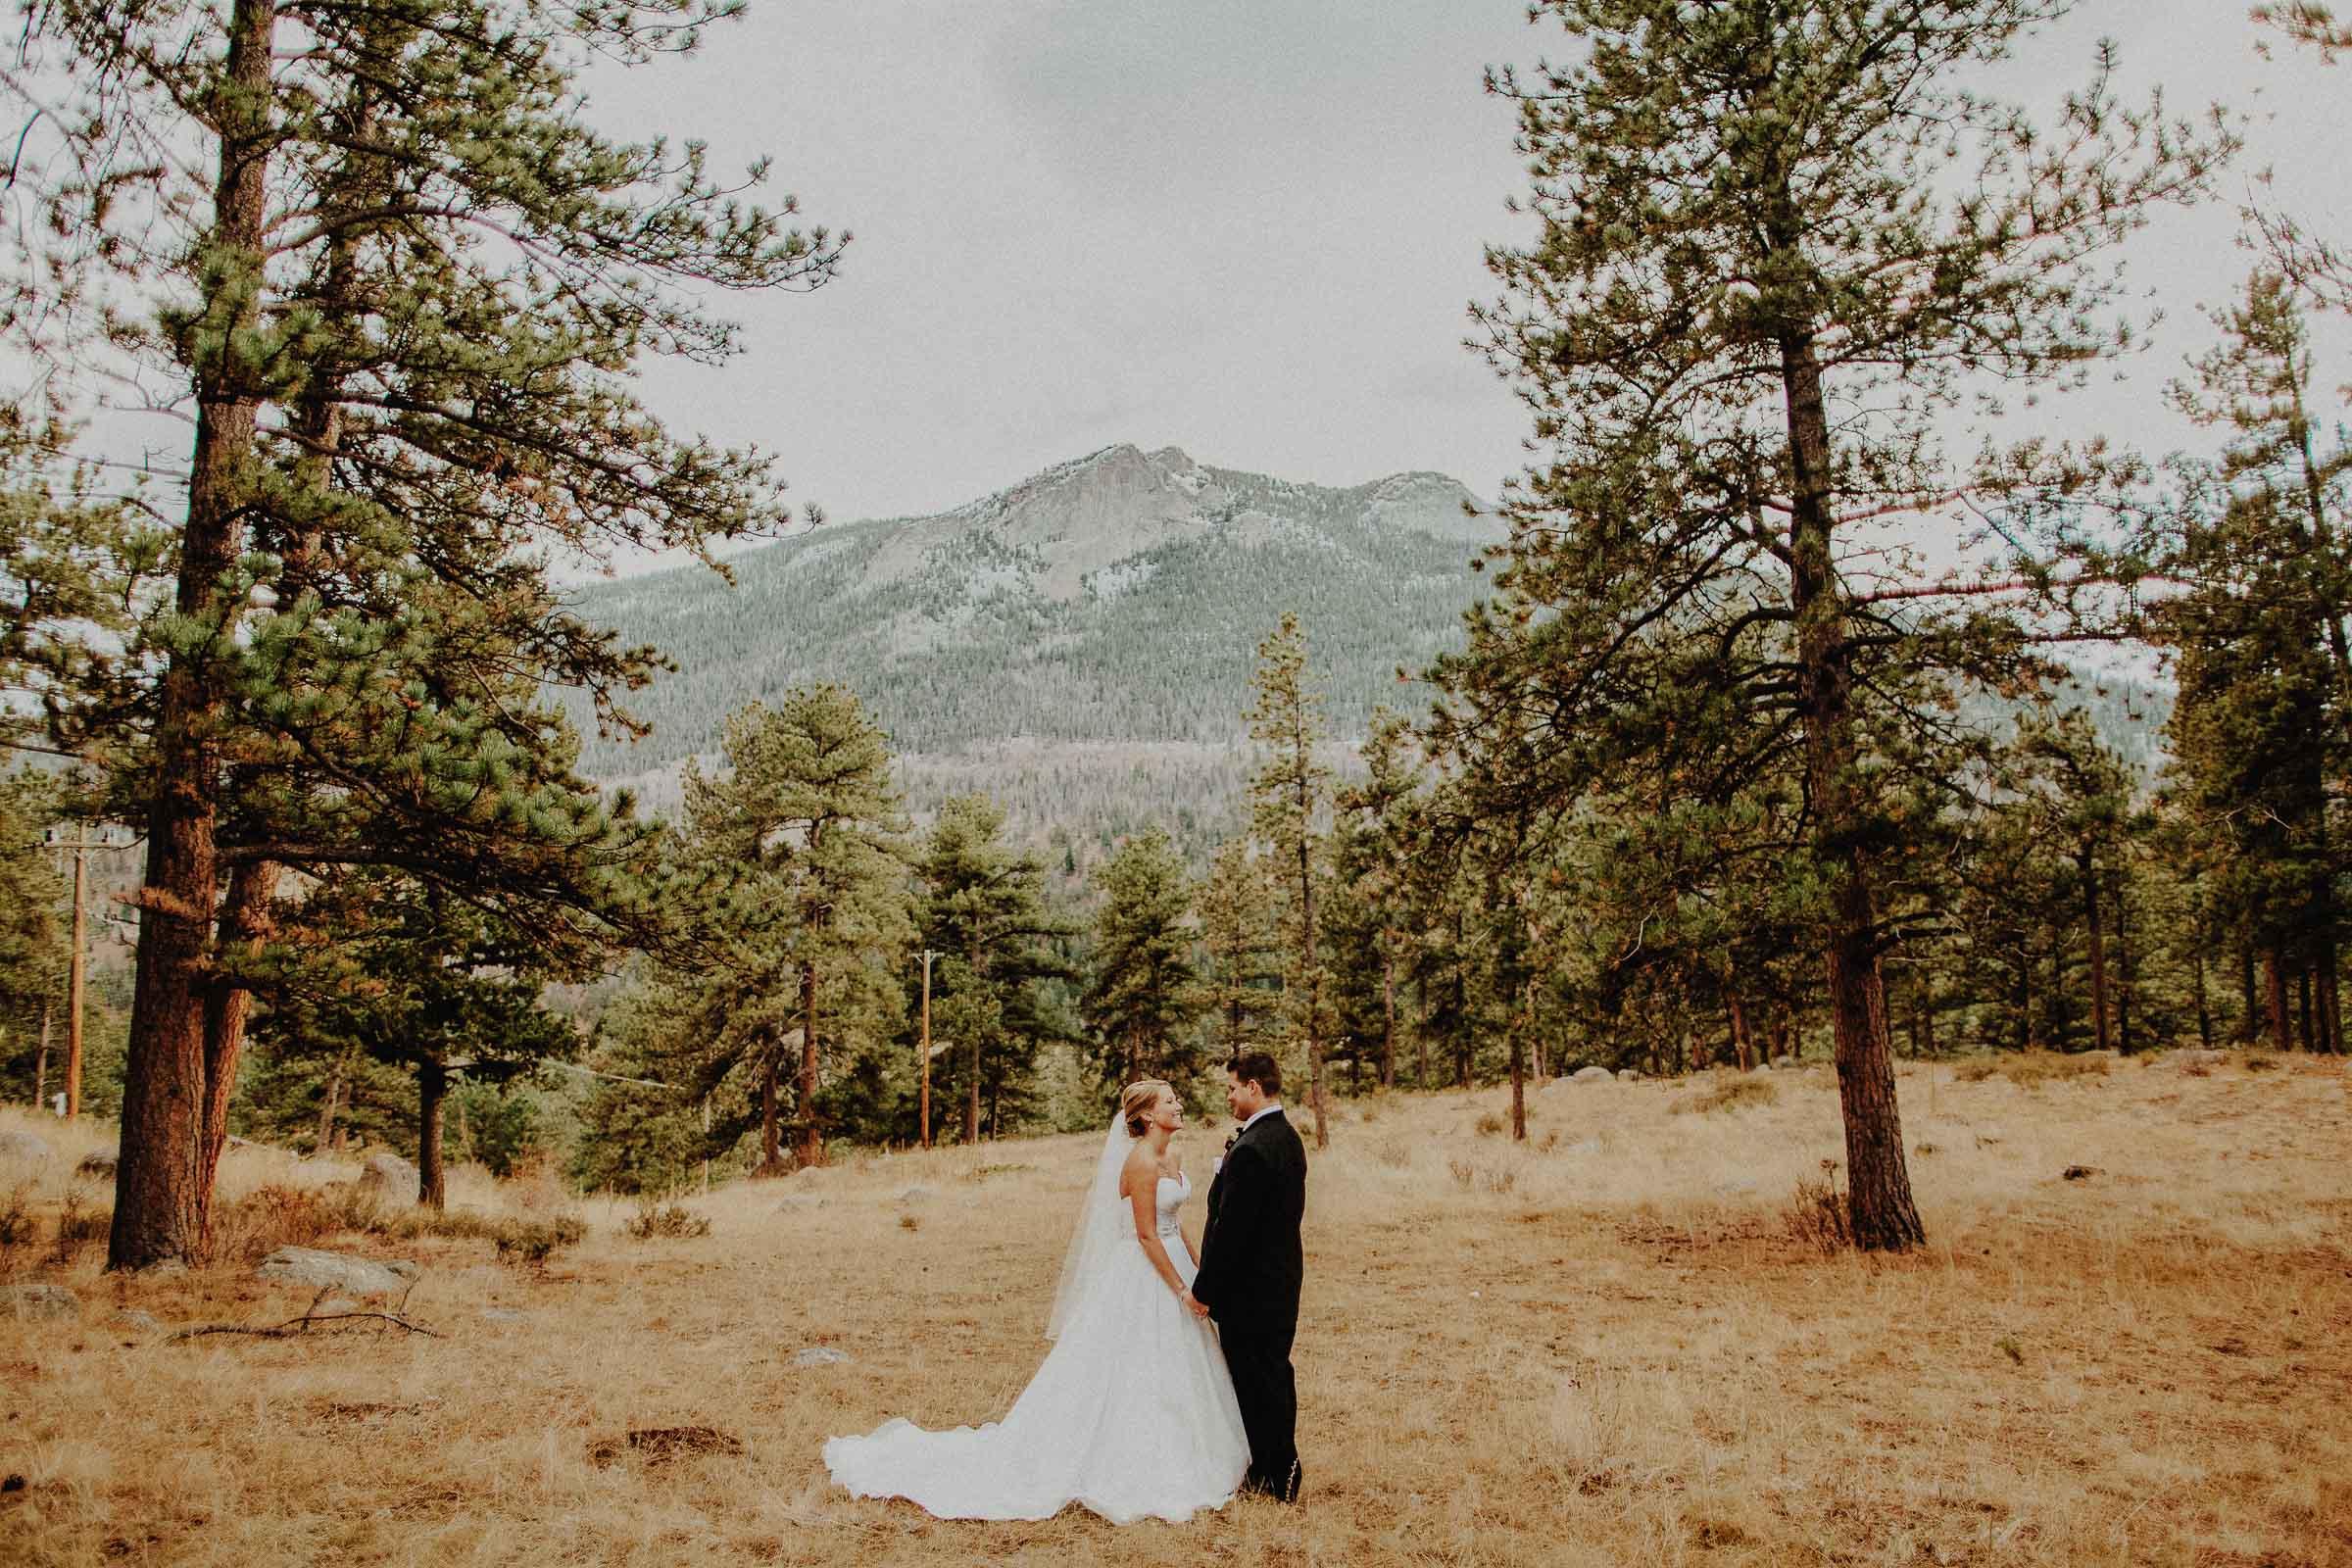 Ryan + Anne  Della Terra Mountain Chateau Wedding in Estes Park, Colorado     View